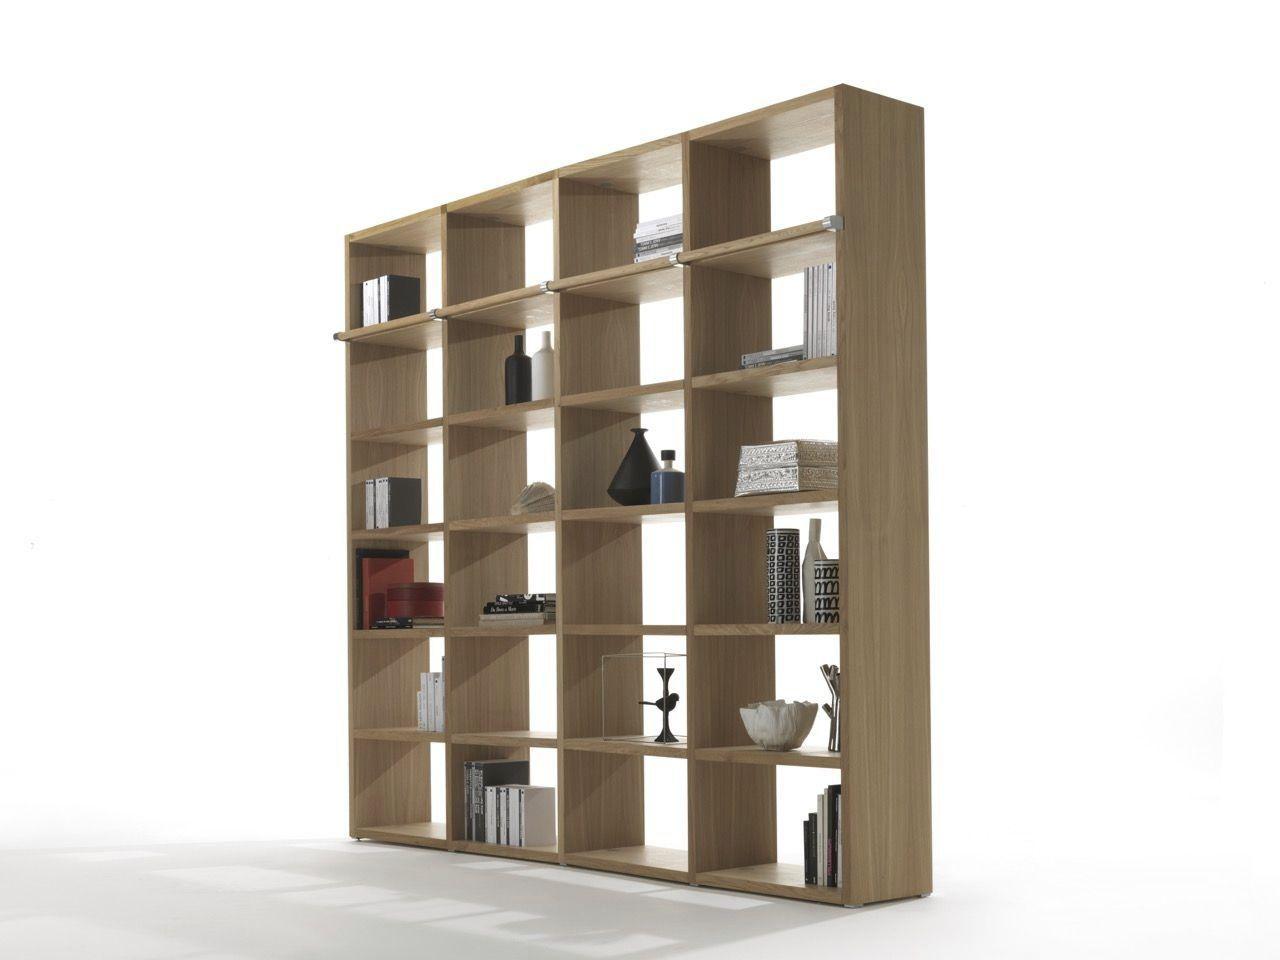 bookshelf o elm industrial modular west rustic products